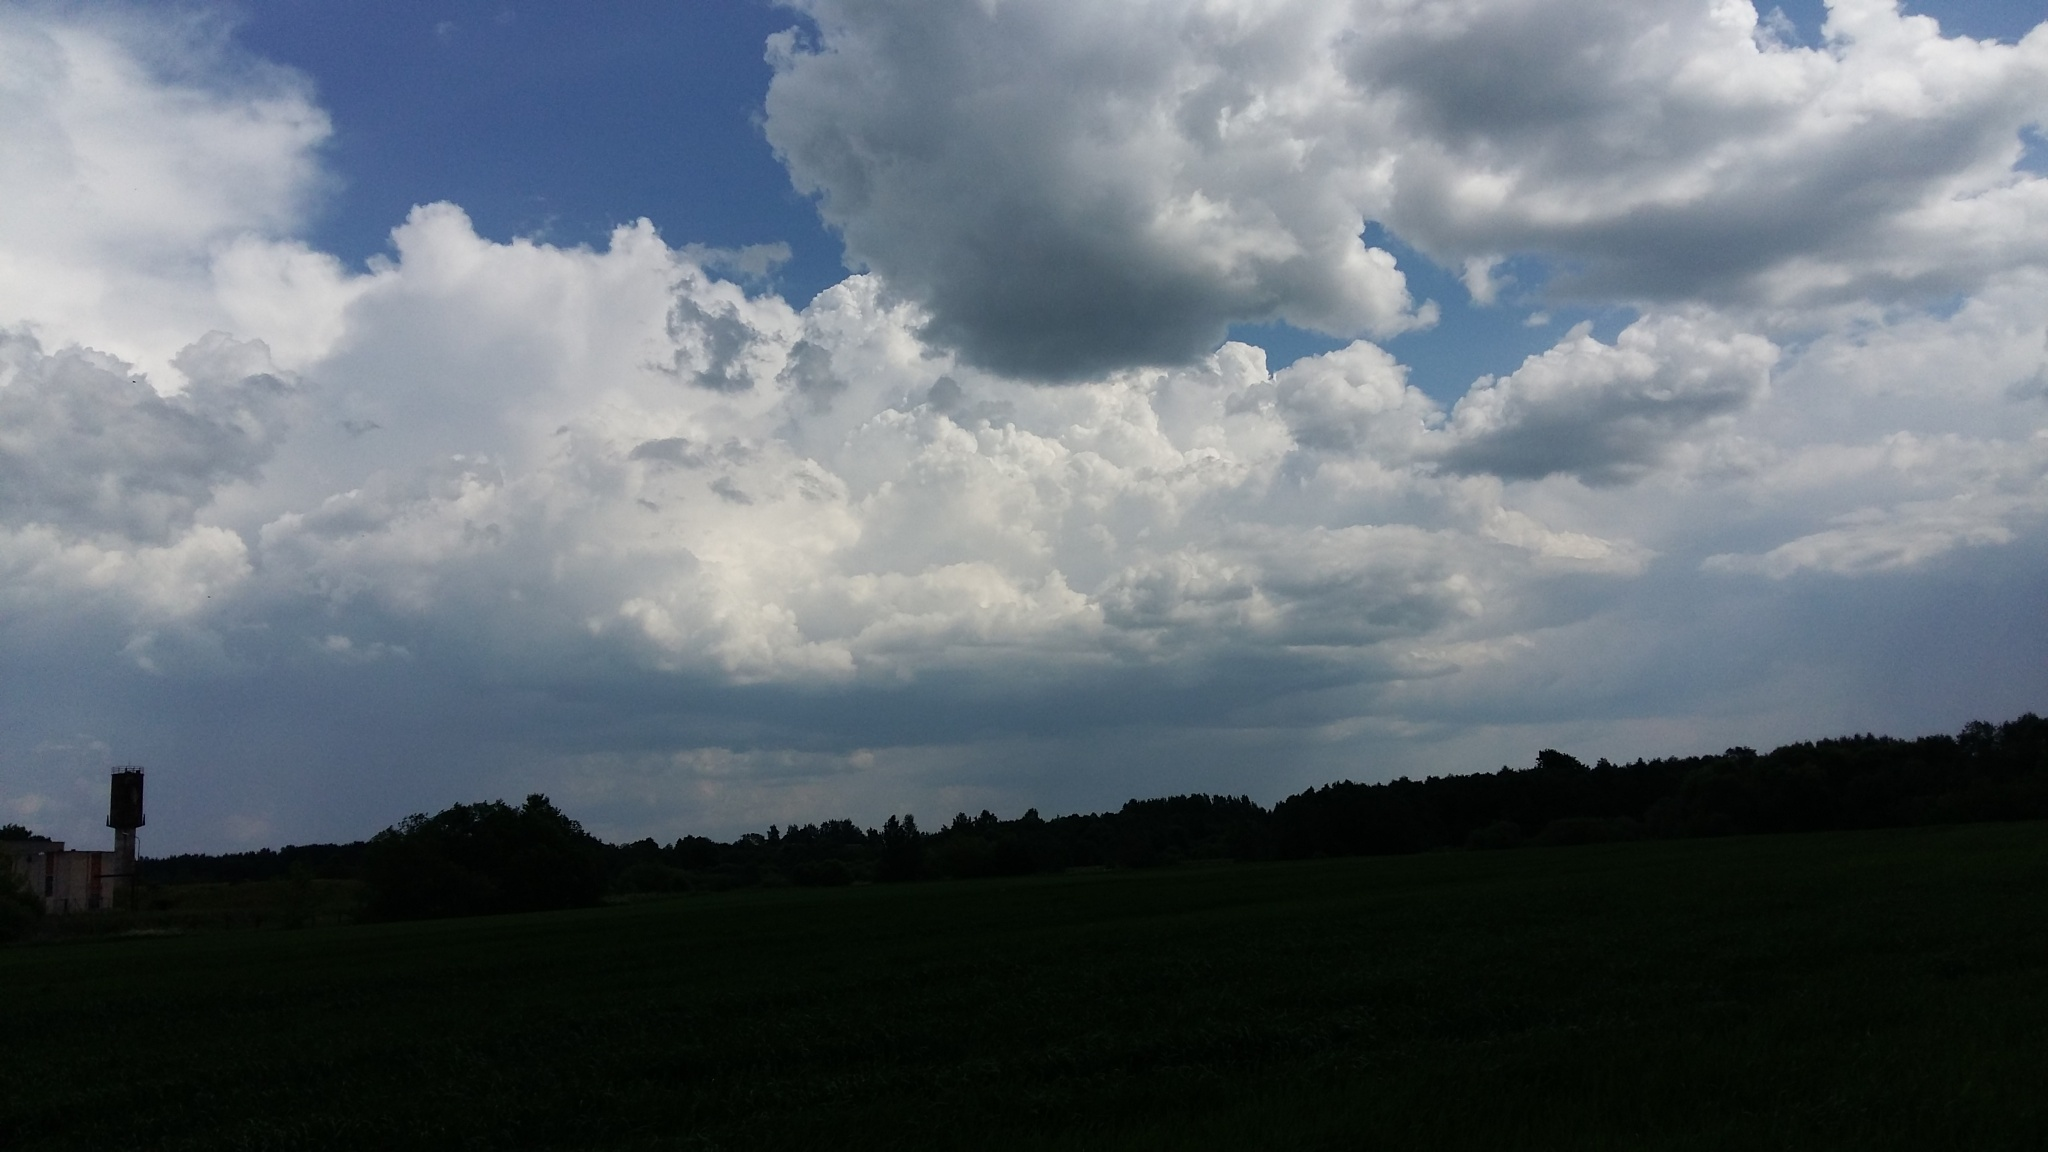 Clouds by uzkuraitiene62